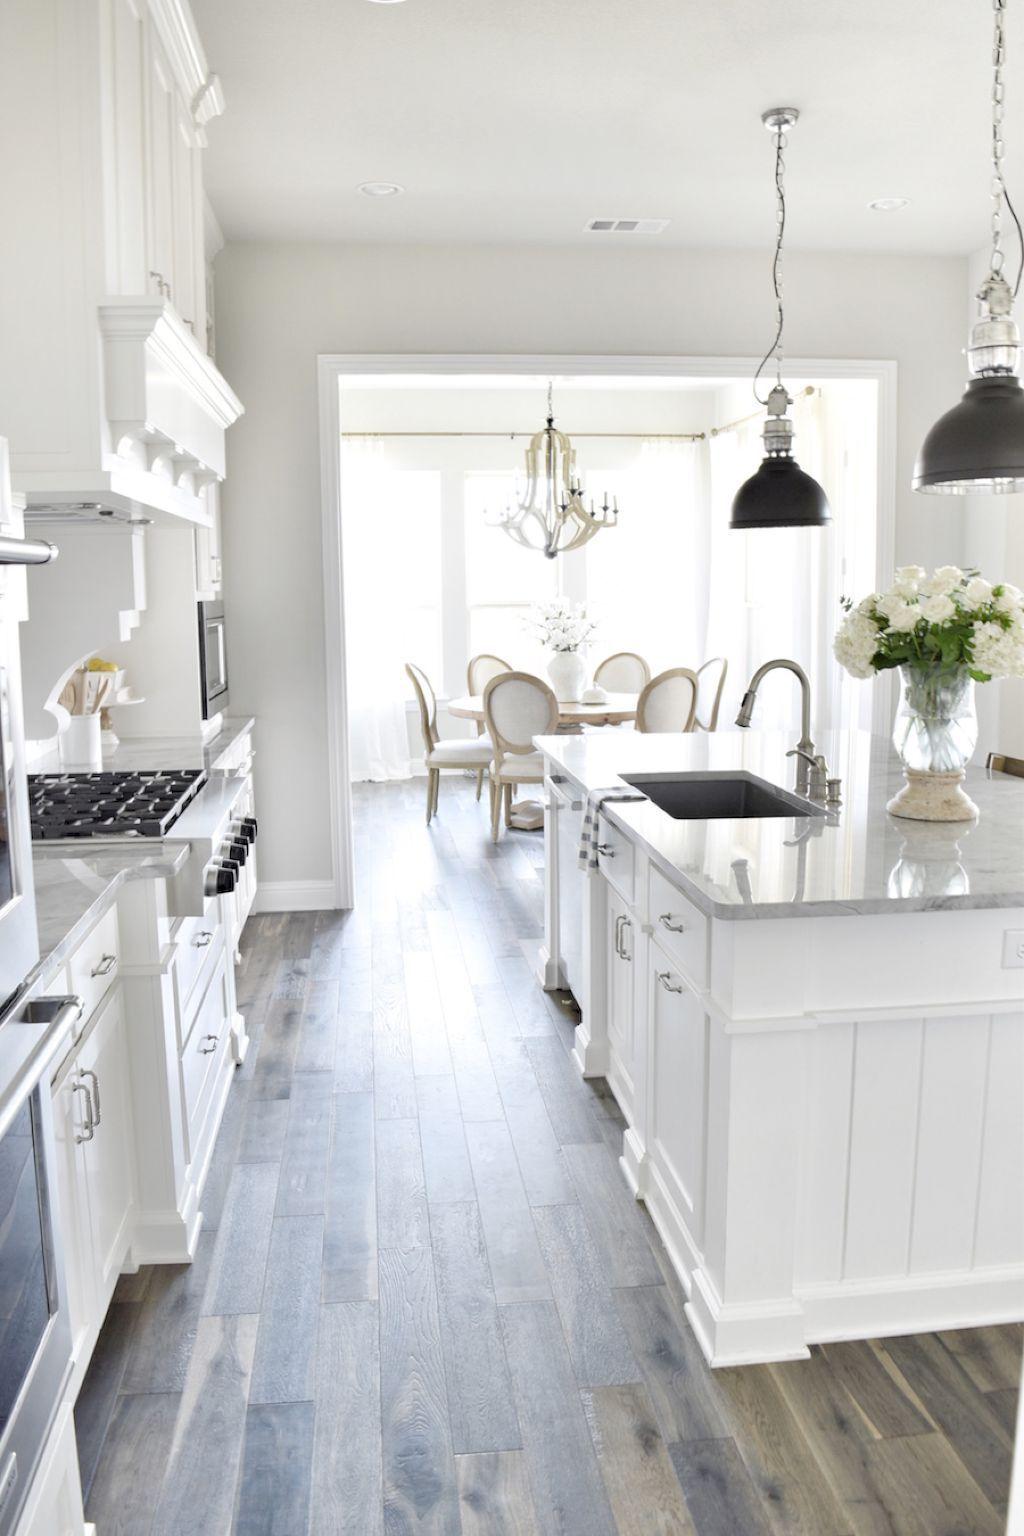 9 Luxury White Kitchen Decor Ideas luxuryinteriordesign ...